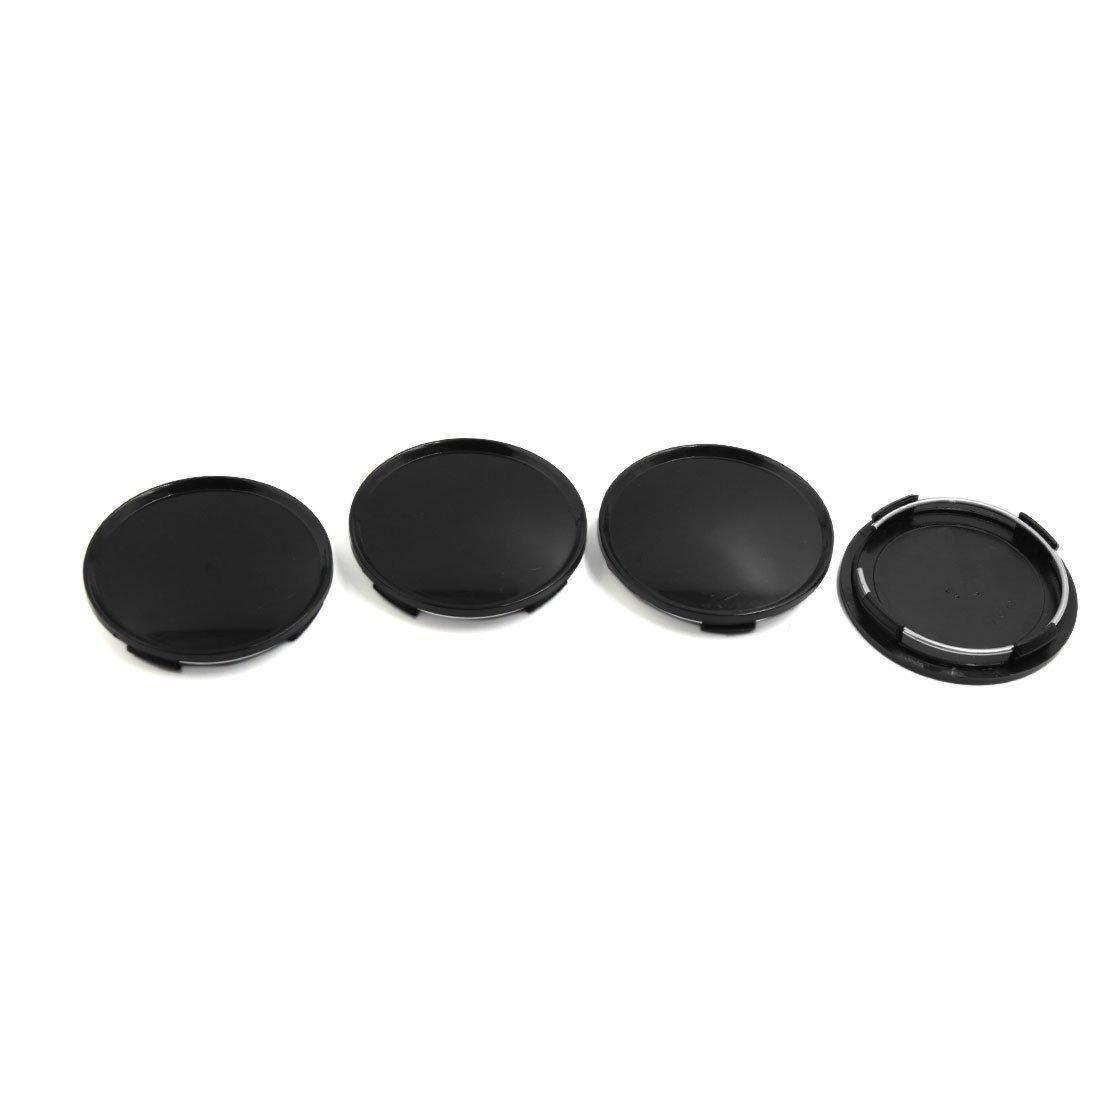 4pcs Black 63mm Diameter Wheel Center Hub Cap Cover Guard for Car Auto